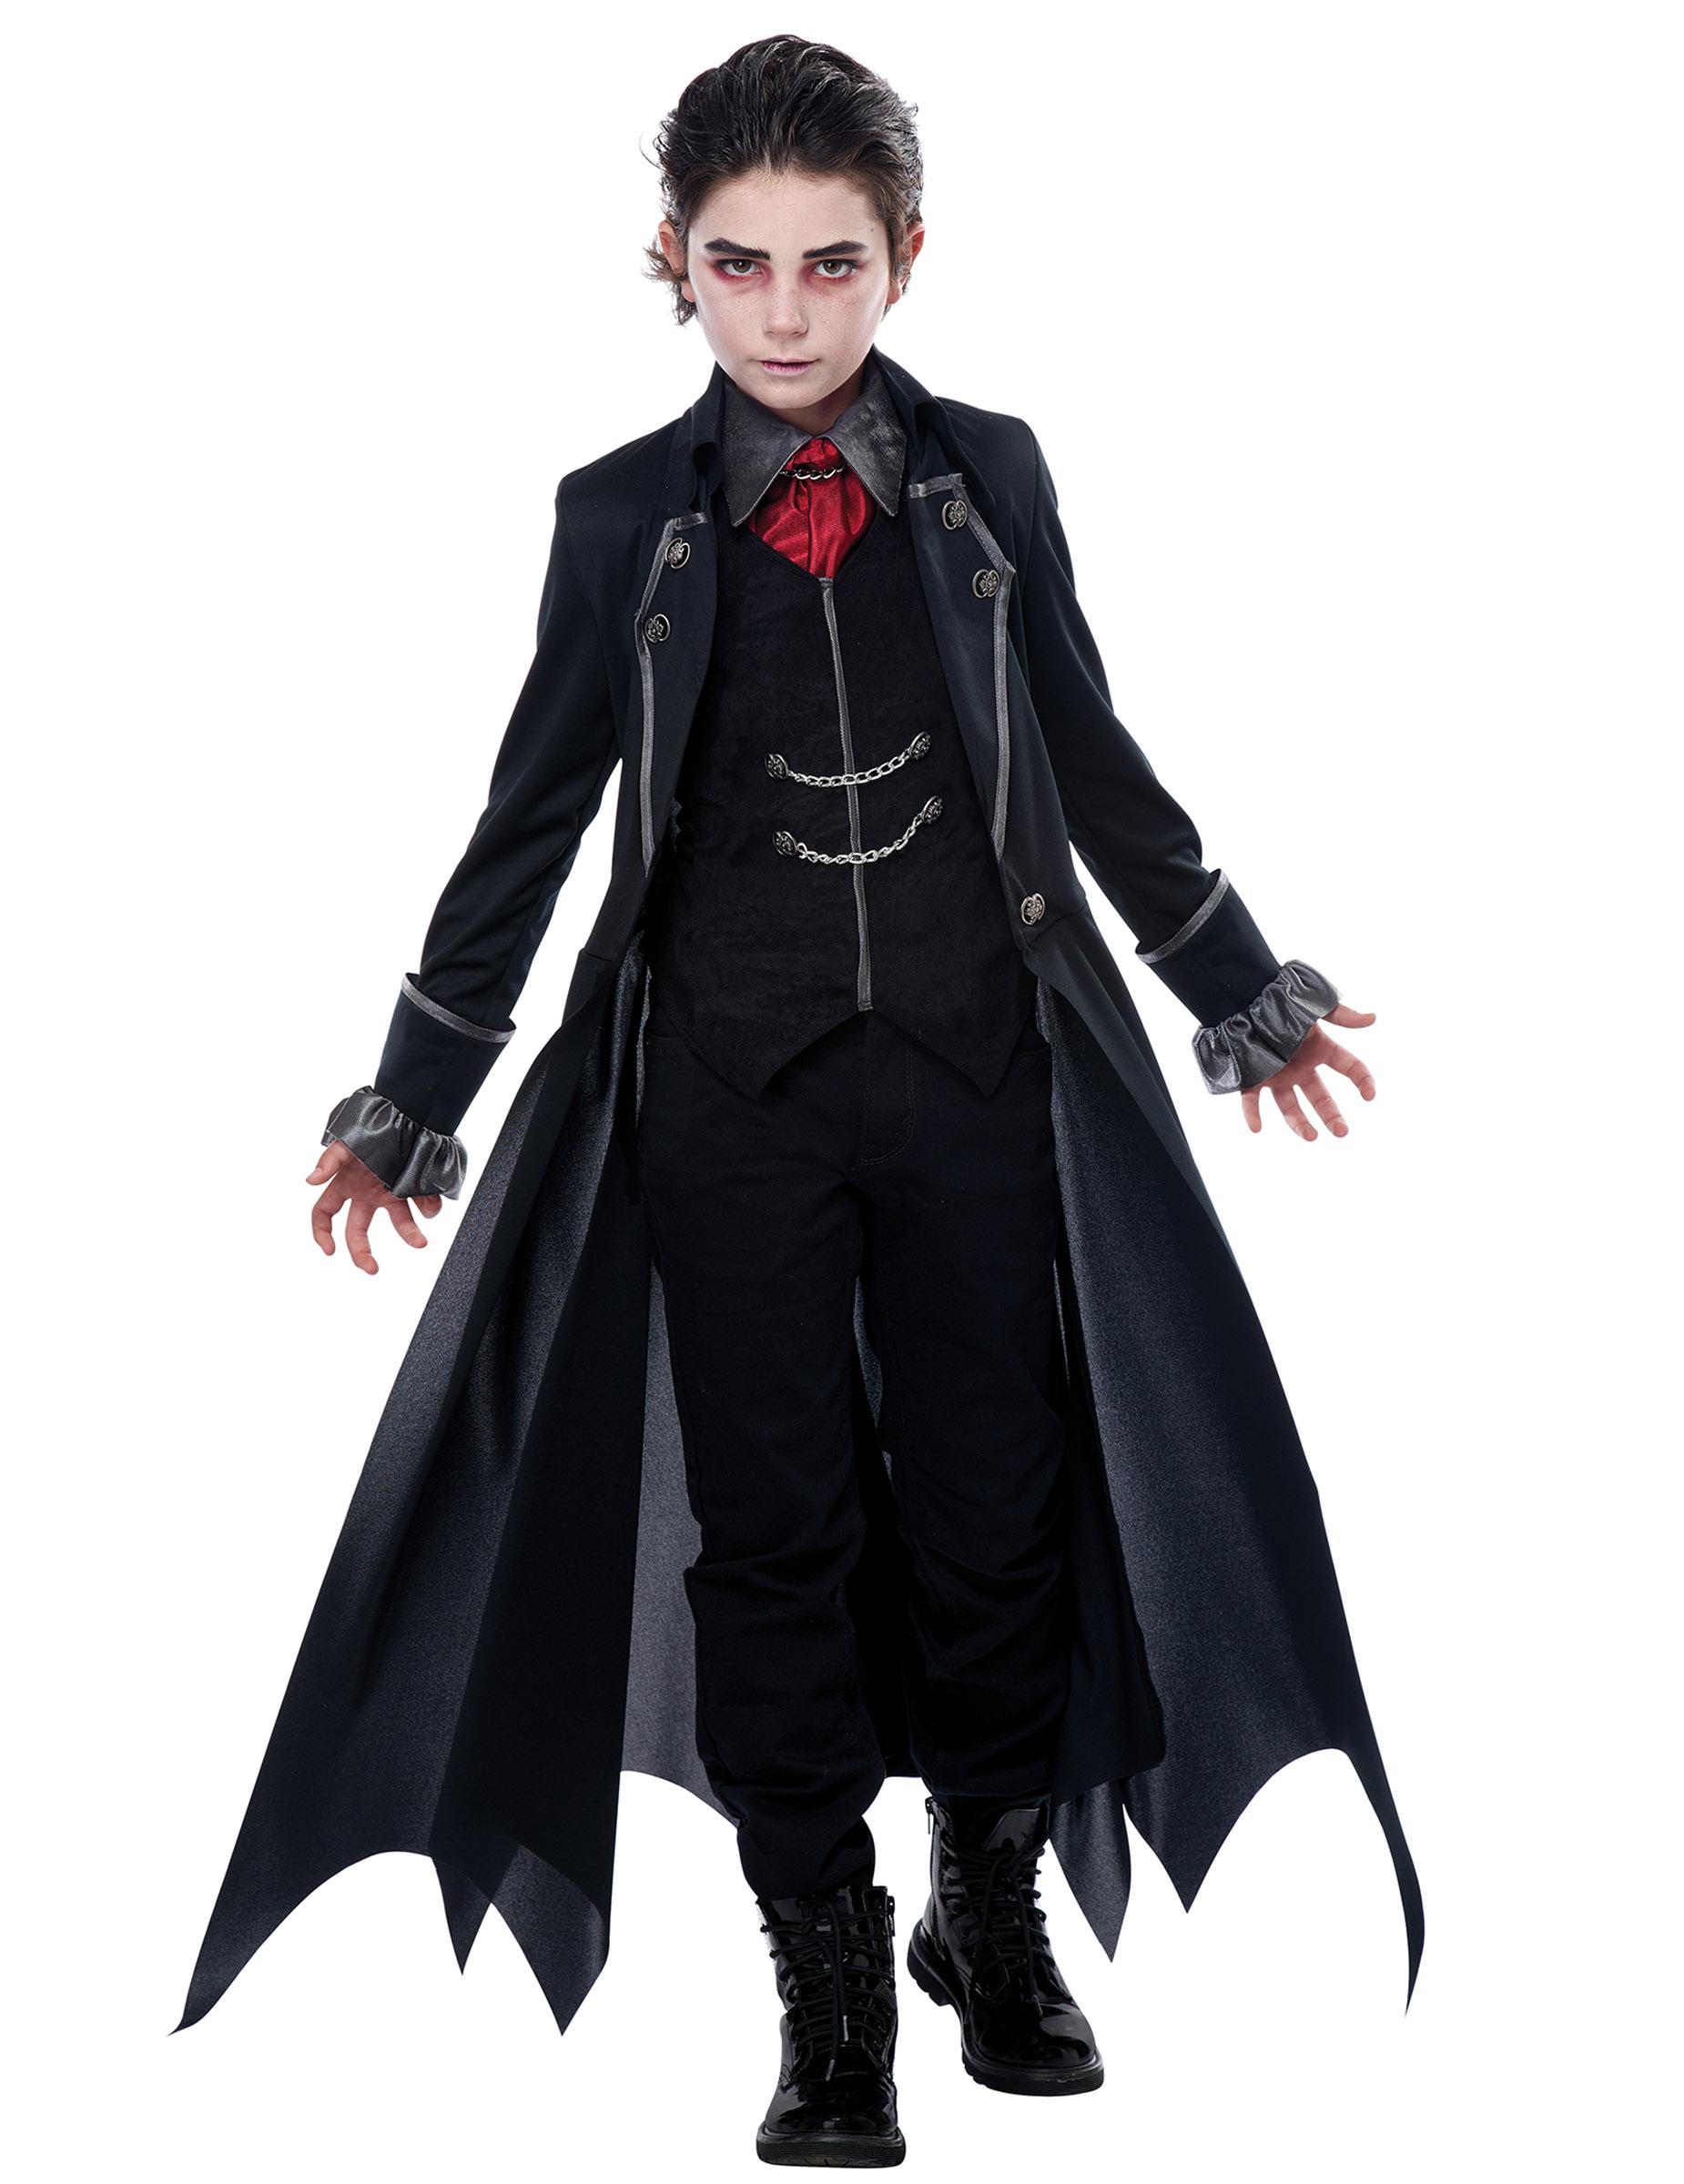 Halloween Kostume Jungs.Vampir Kostum Fur Jungen Halloween Schwarz Rot Gunstige Halloween Kostume Bei Horrorklinik